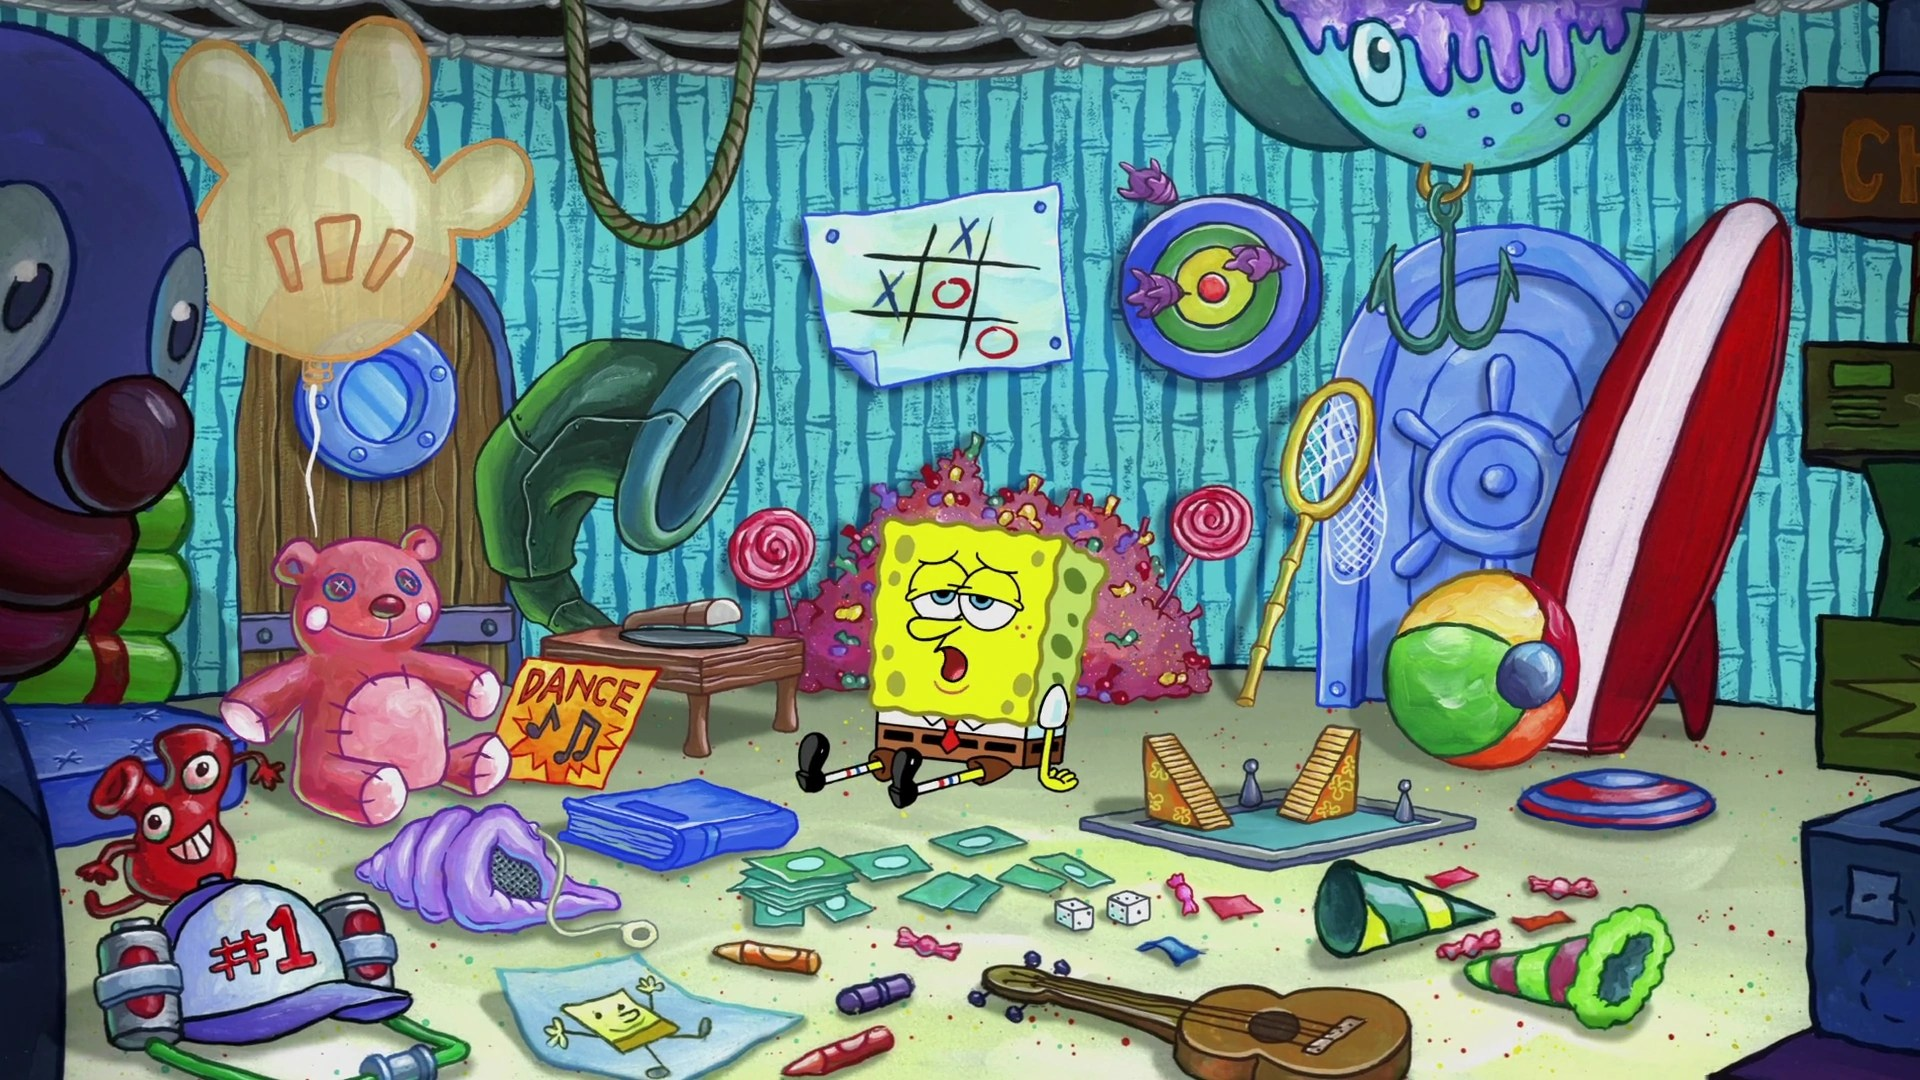 Spongebob Dailymotion Season 3 (7) - Modern Home Revolution